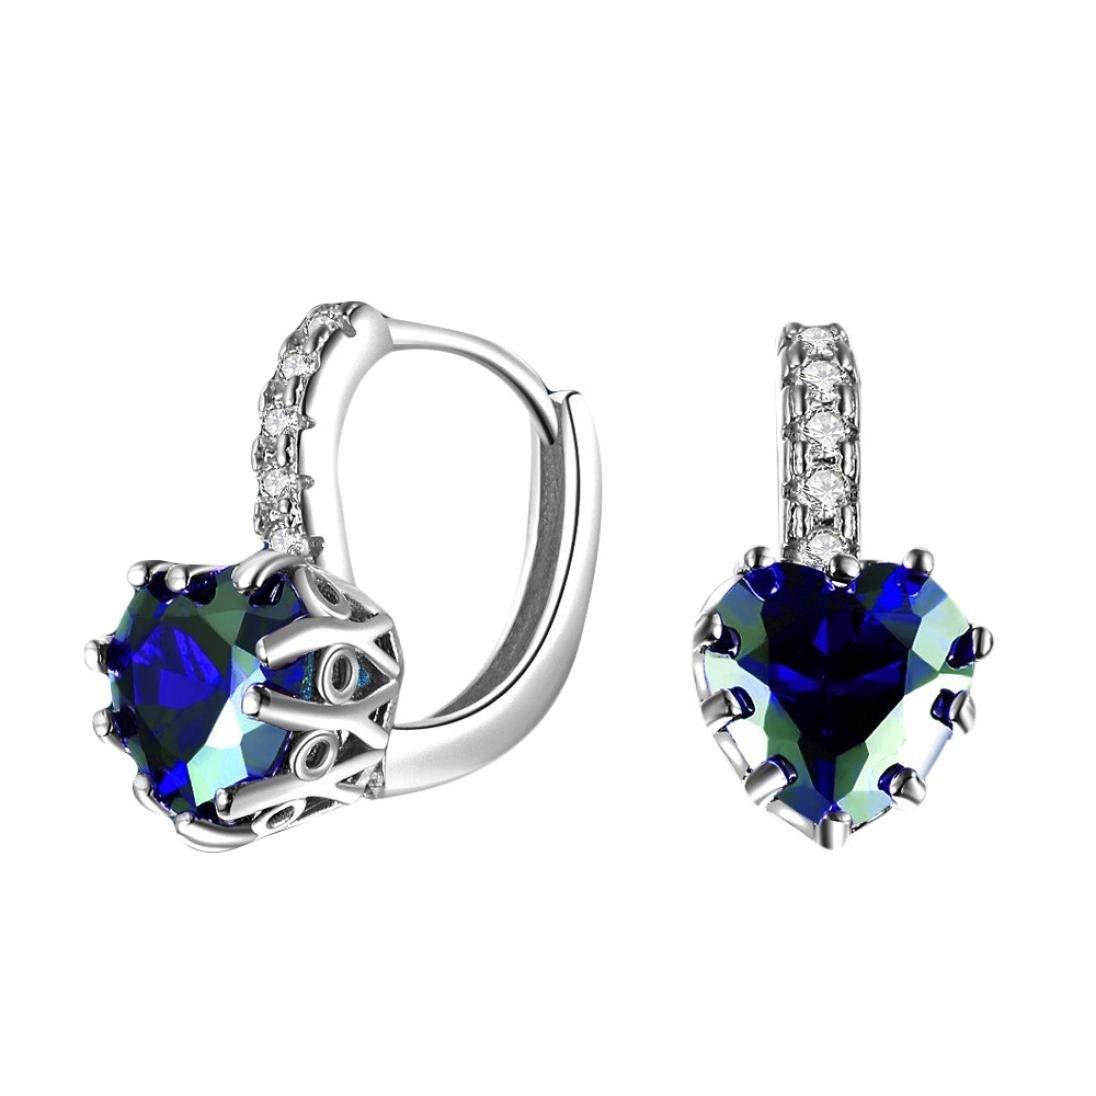 Clearance Deal! Hot Sale! Earring, Fitfulvan 2018 Simple Fashion Diamond Ear Stud Earrings Mother's Day Gifts Earrings Jewelry (Sliver)